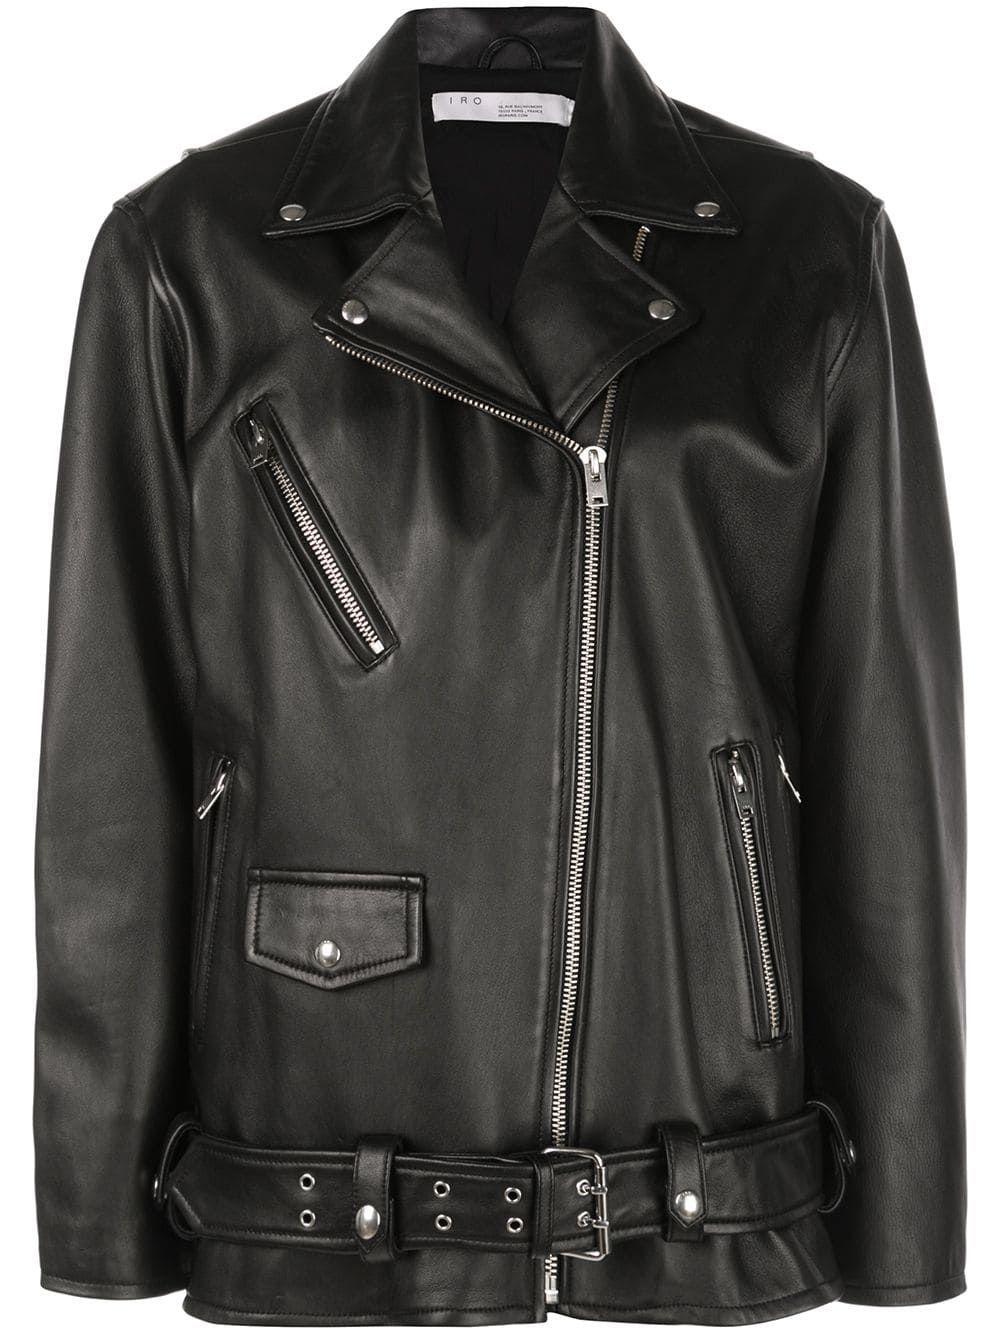 Iro oversized biker jacket Black Biker jacket, Jackets